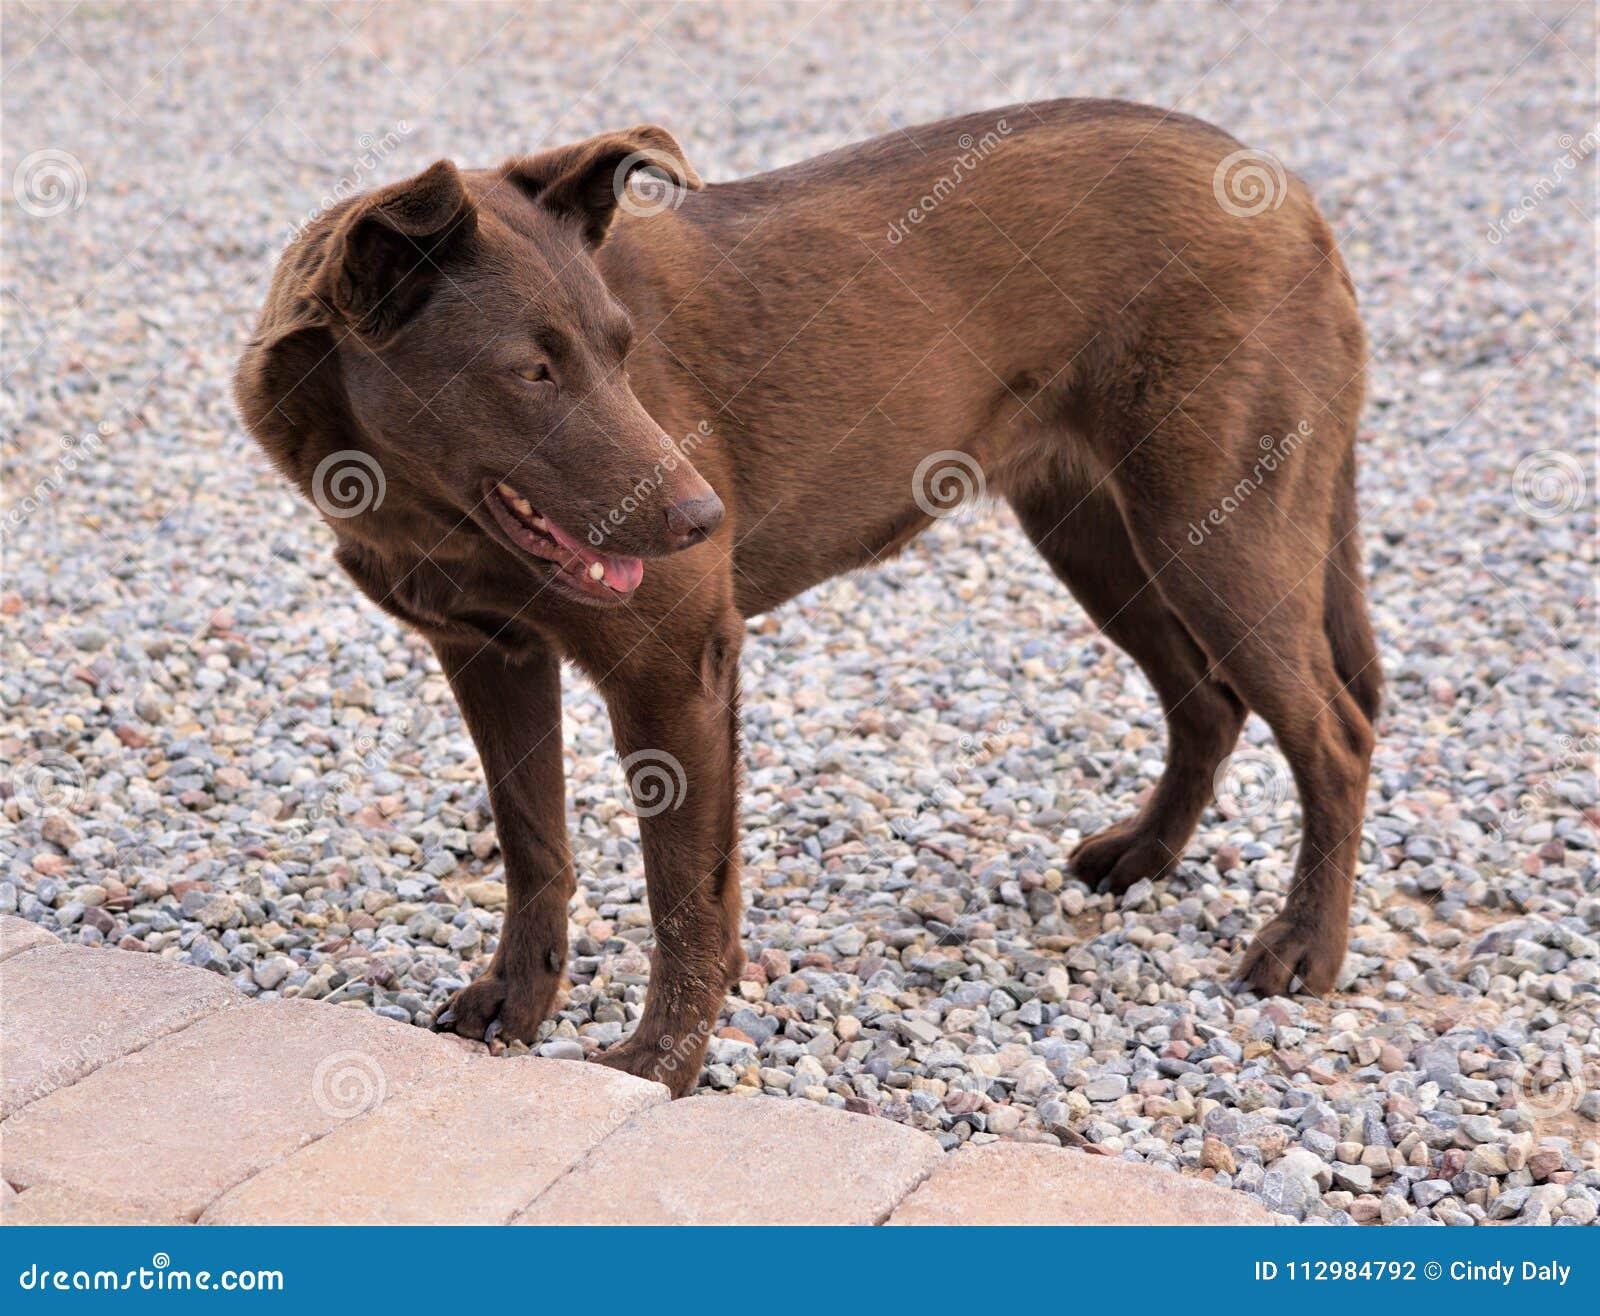 A photograph of an Australian Kelpi dog